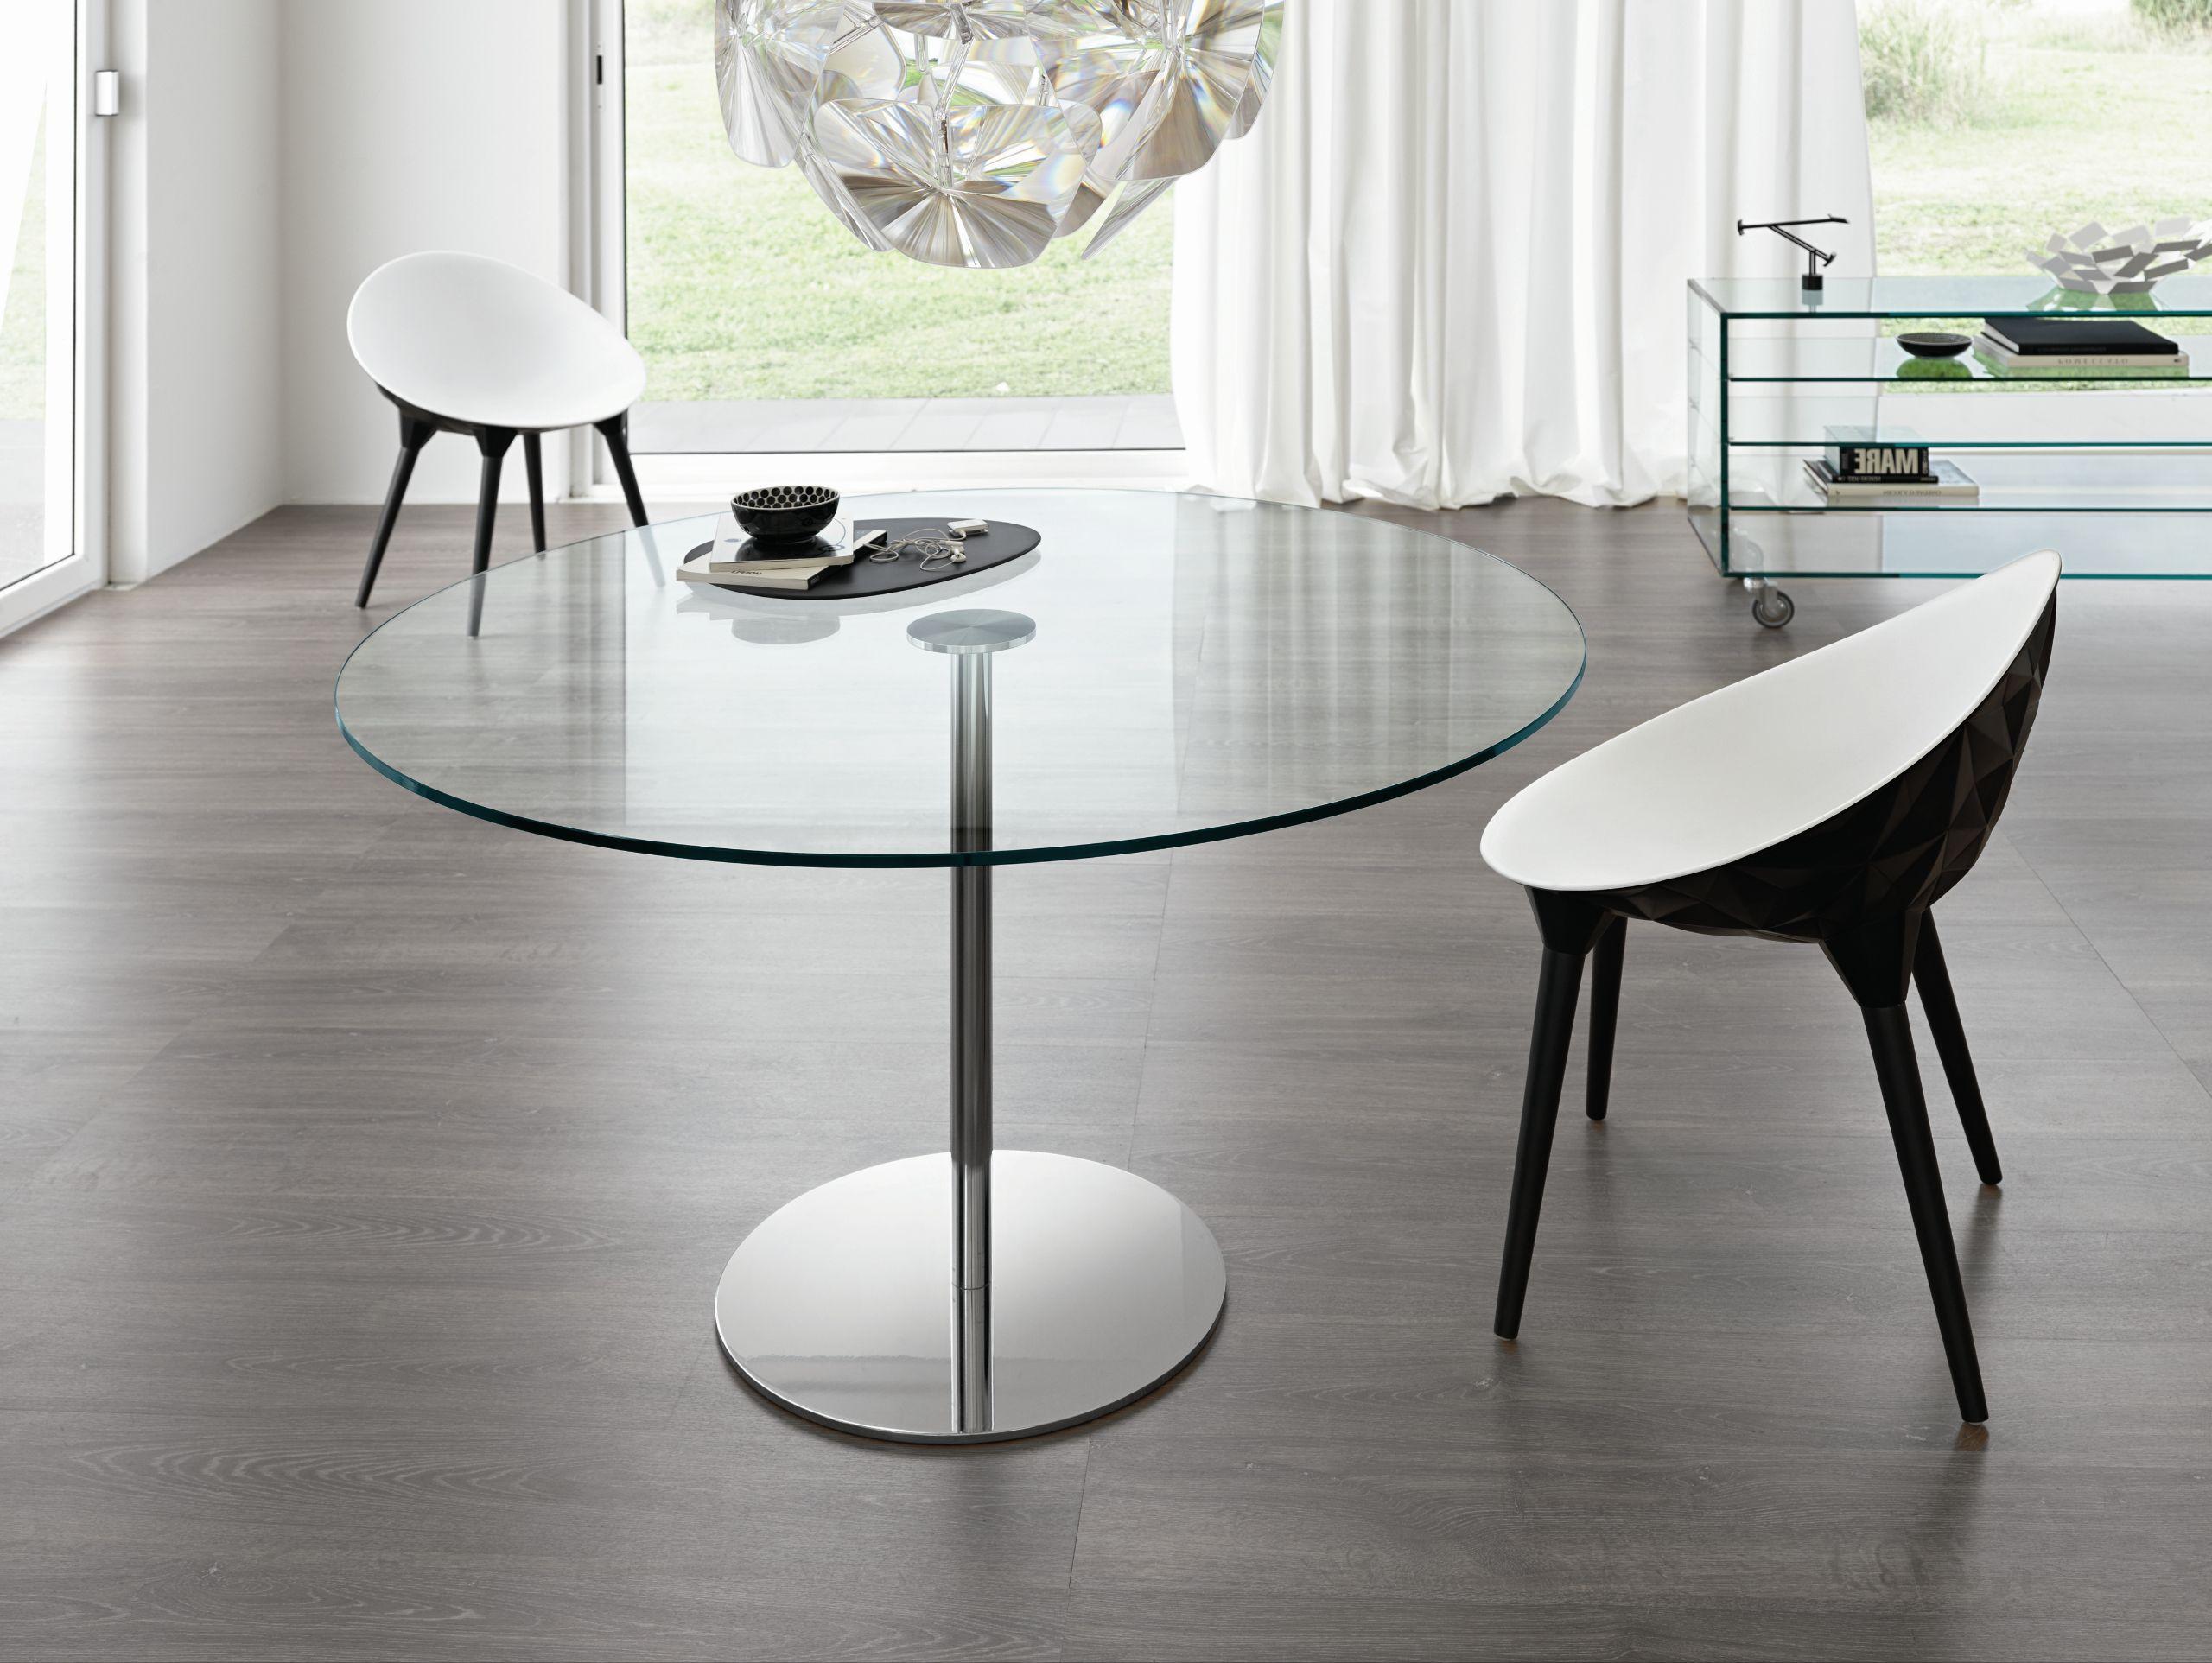 Farniente alto mesa redonda by t d tonelli design dise o - Mesas de vidrio templado ...